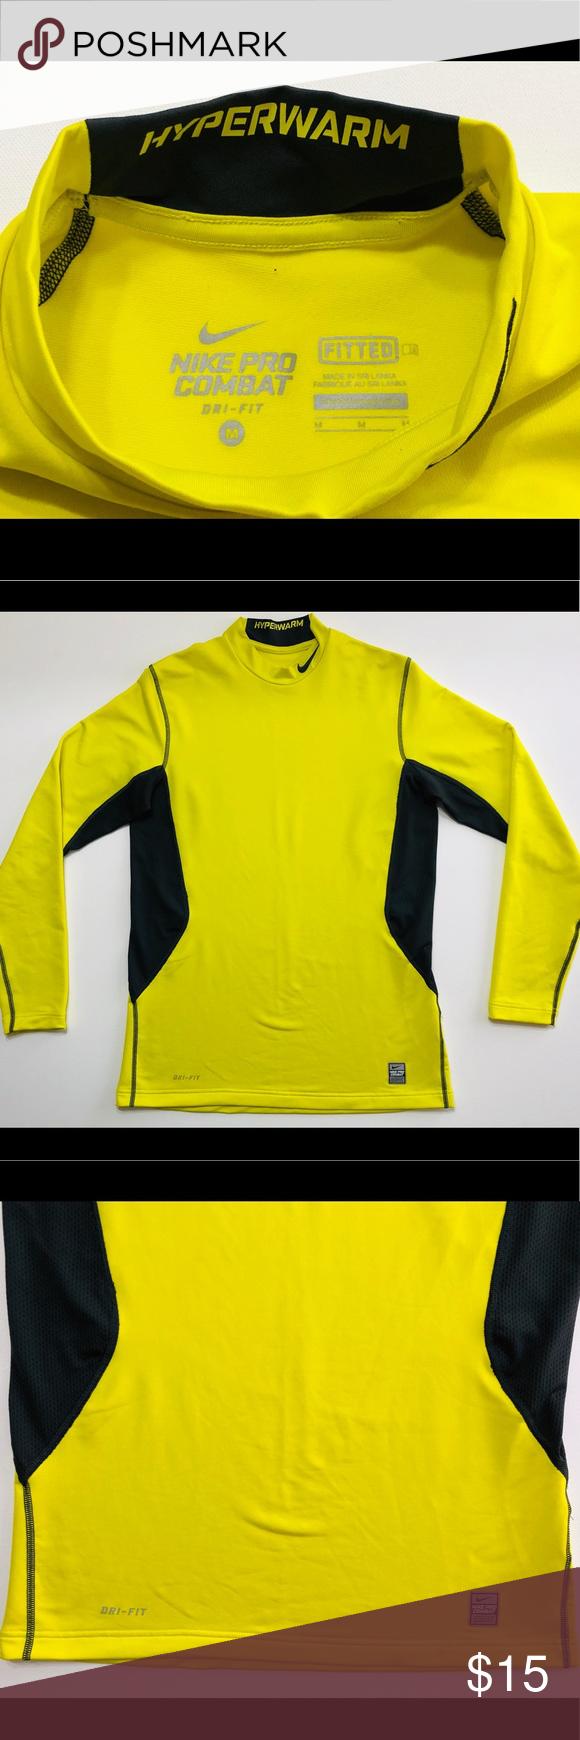 Chicle Hecho un desastre reunirse  Nike Hyperwarm Dri Fit Max Shield Comp Mock Preowned - Men's Nike Pro  Combat Hyperwarm Dri Fit Max Shield Comp Mock Size: M Good…   Dri fit,  Fashion, Clothes design